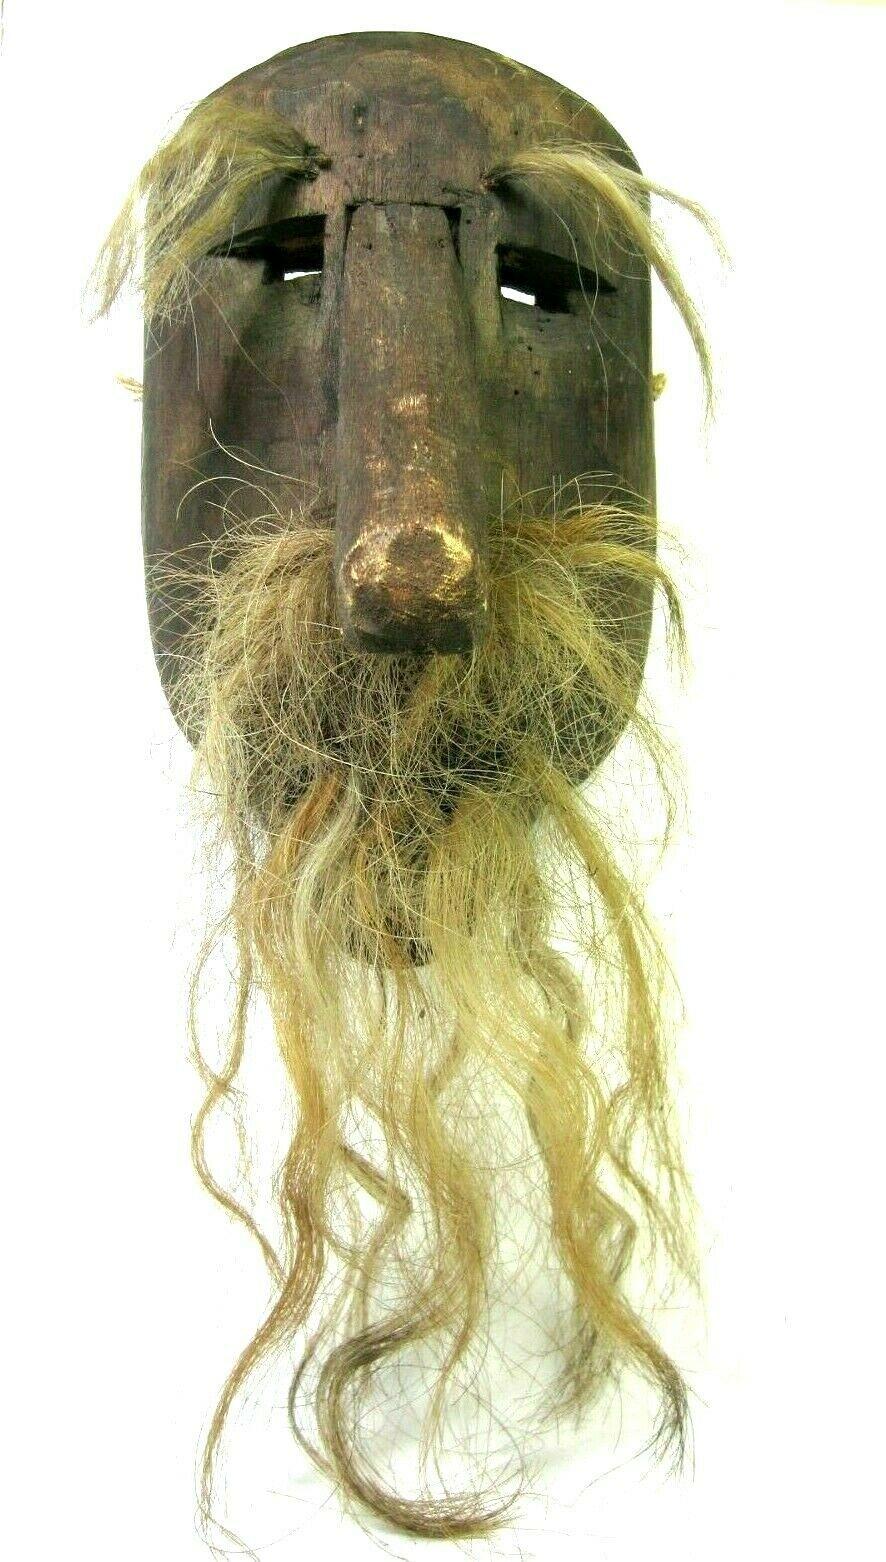 Folk Art Elderly Gentleman with nice head of hair